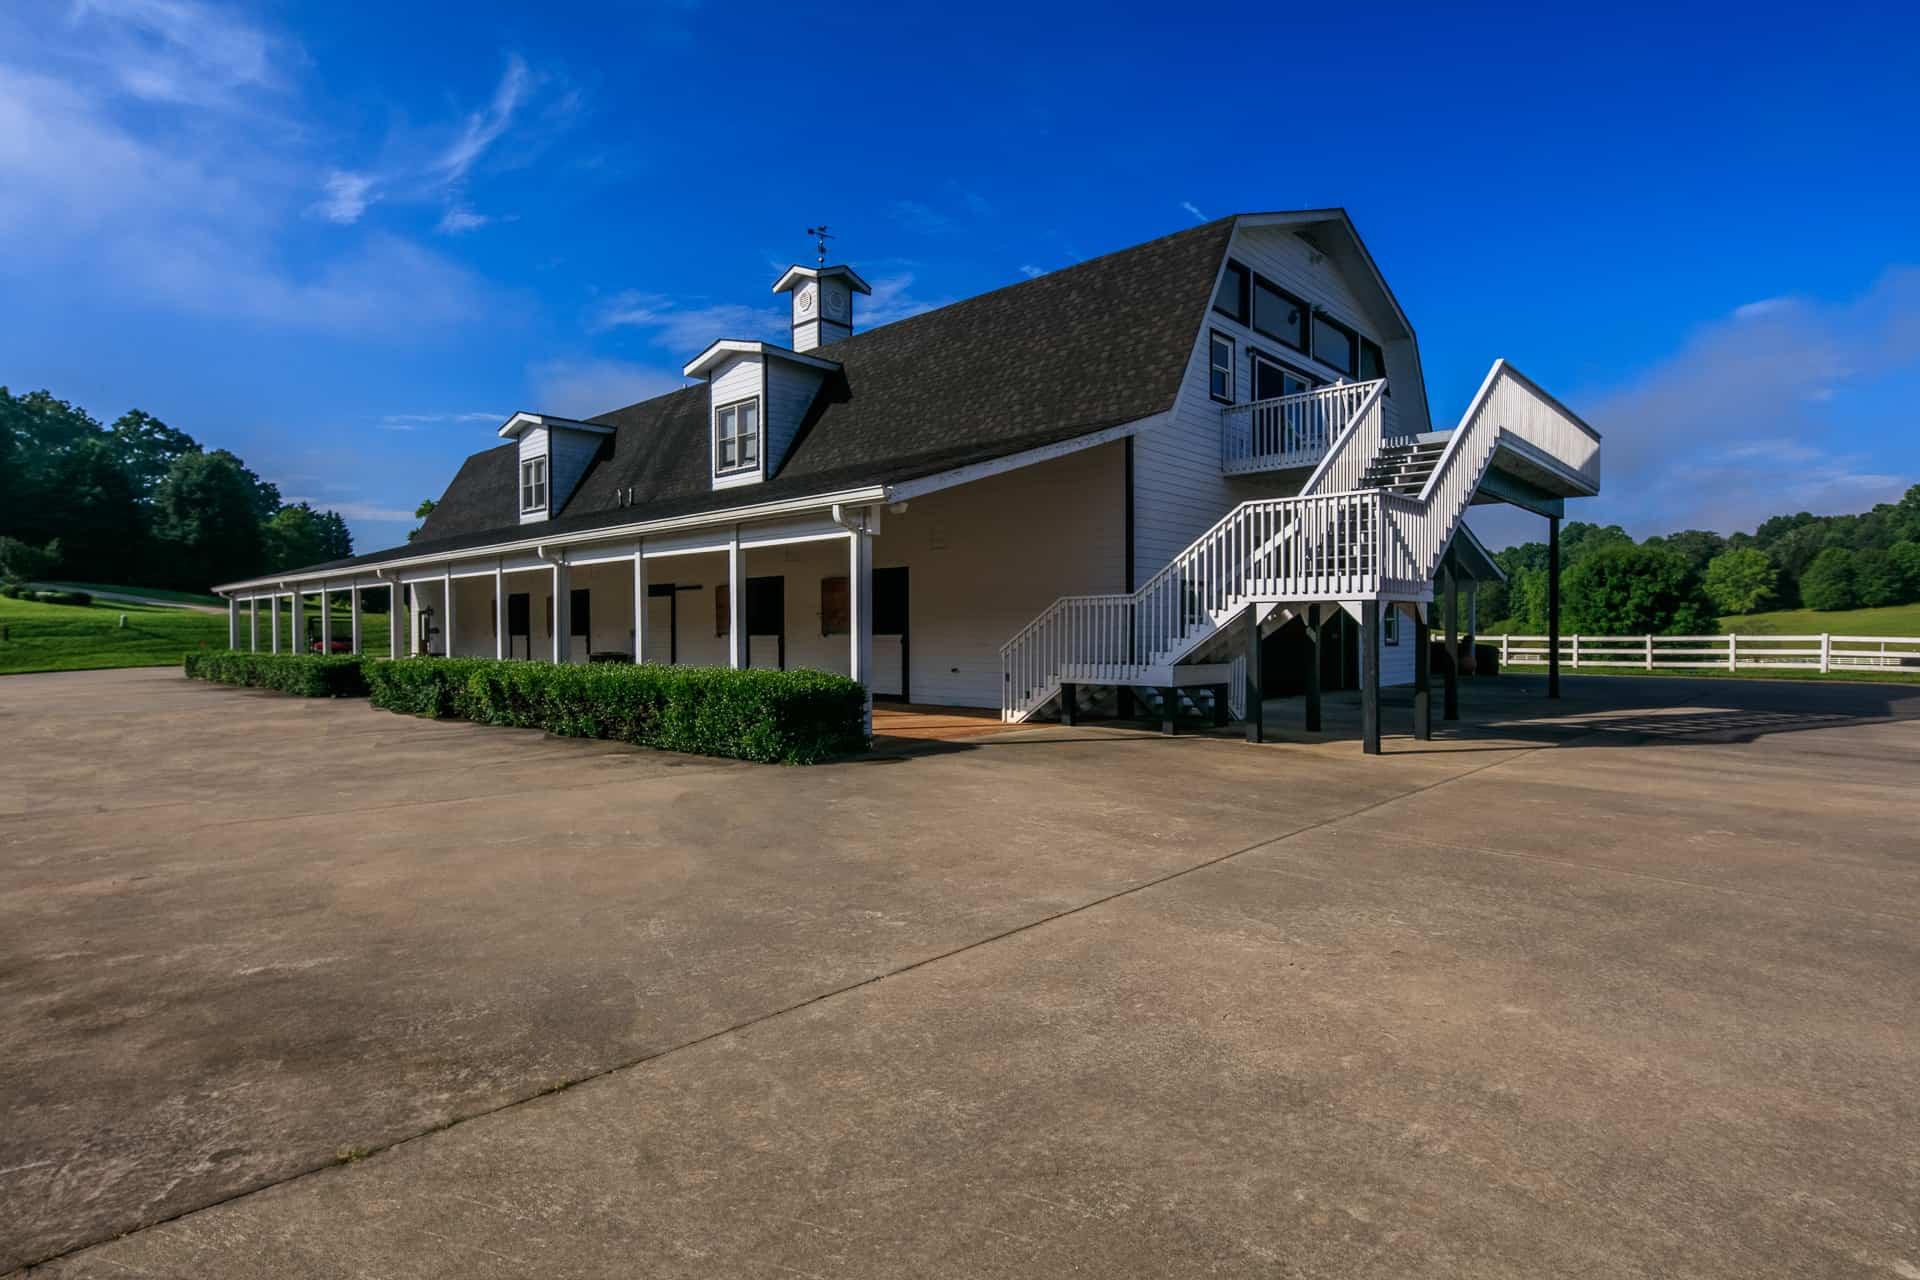 The Horse Shoe Farm